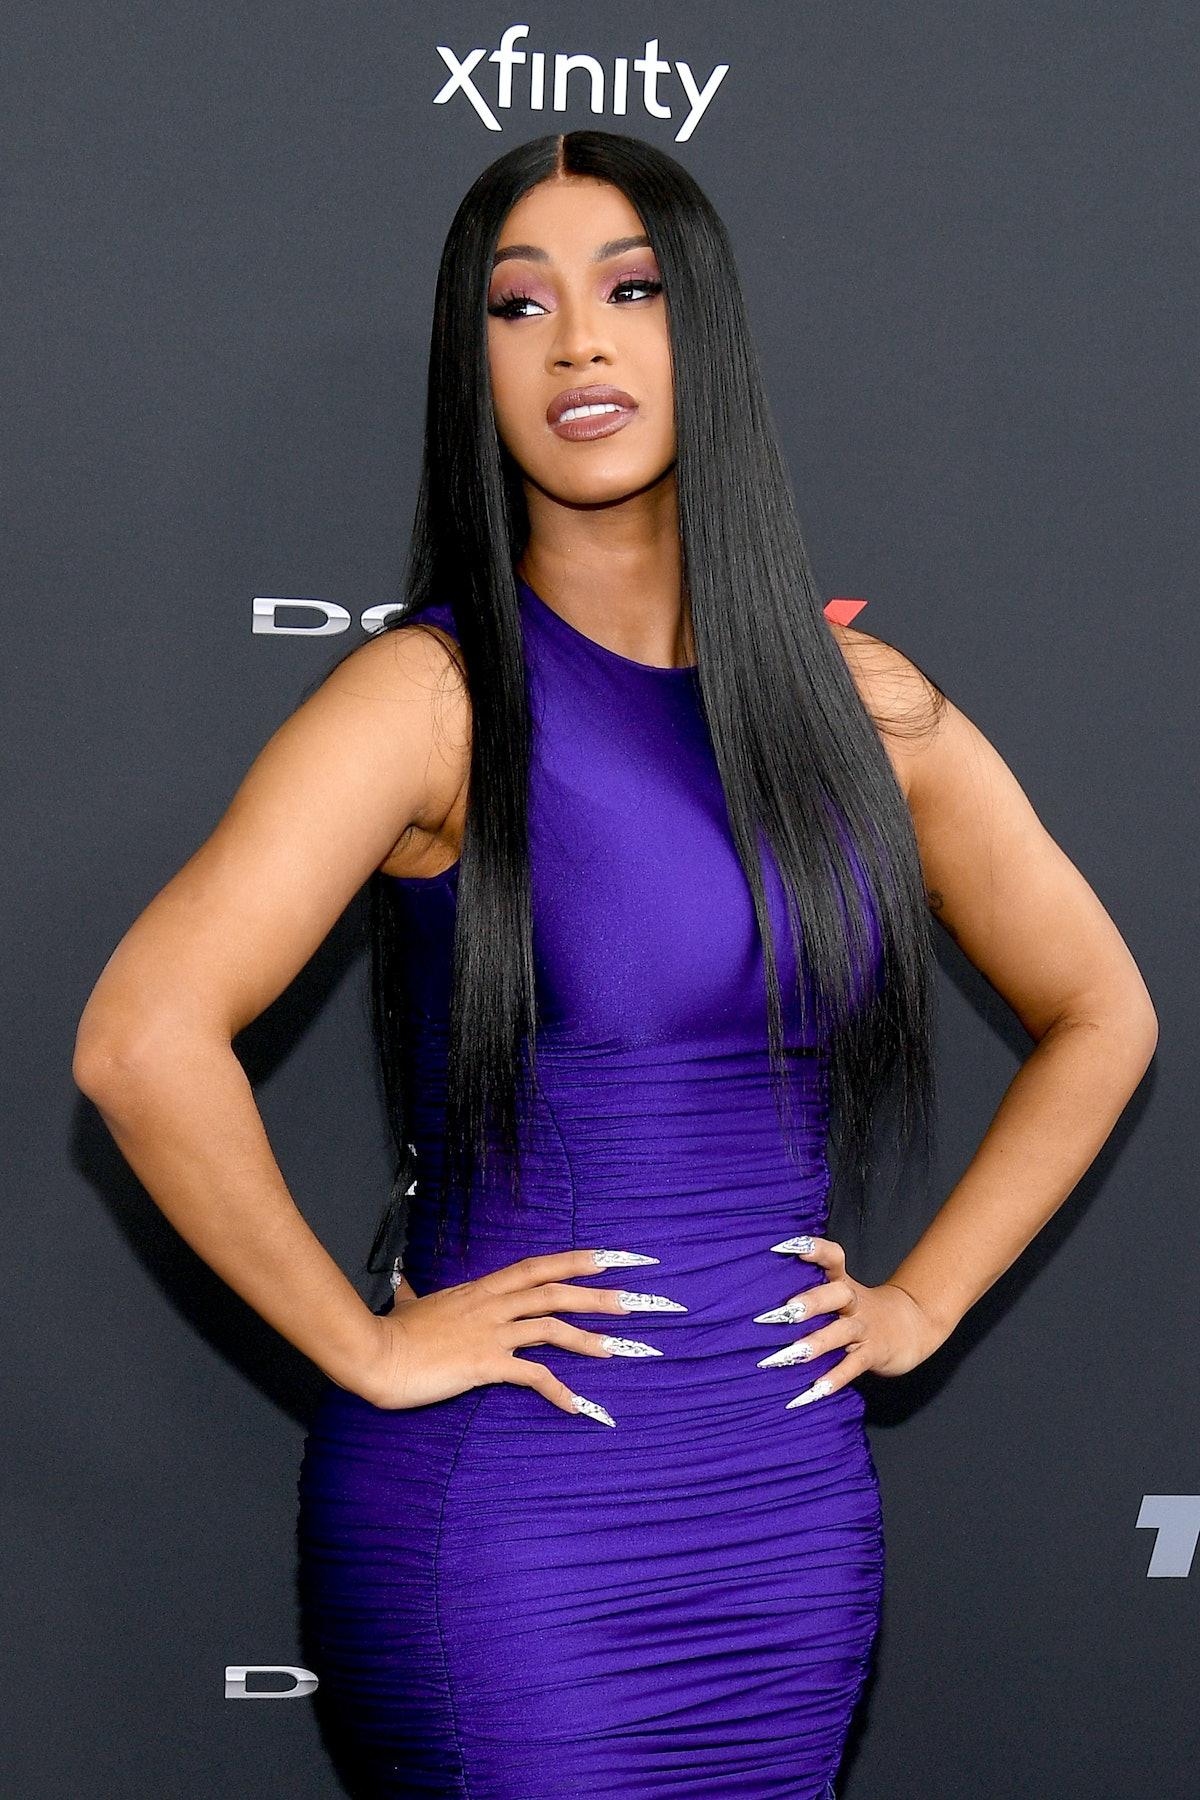 Cardi B hits the red carpet in a purple dress.